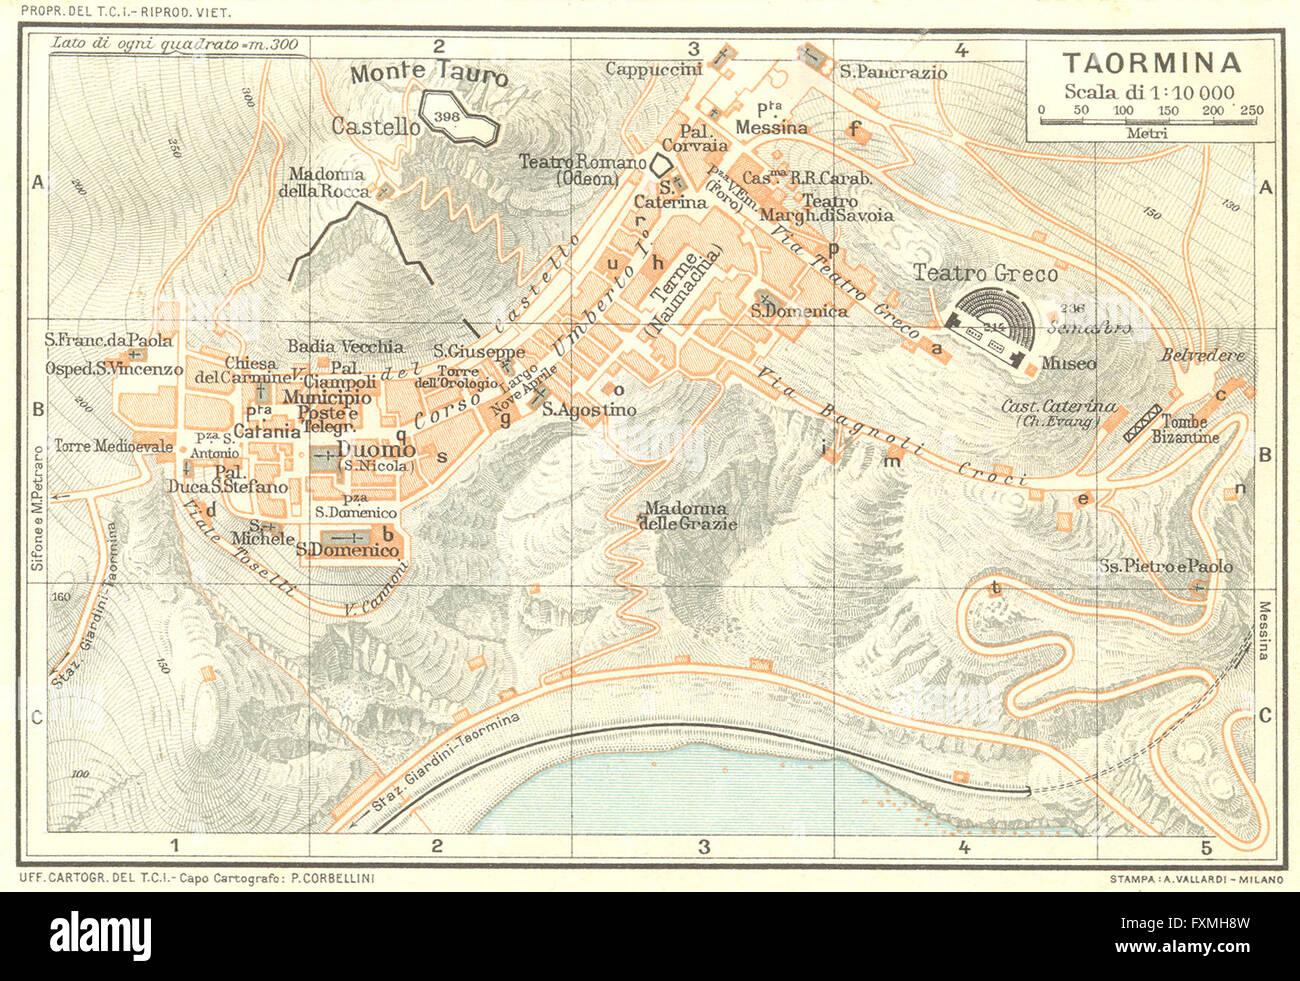 Italy Taormina 1925 Vintage Map Stock Photo 102485513 Alamy